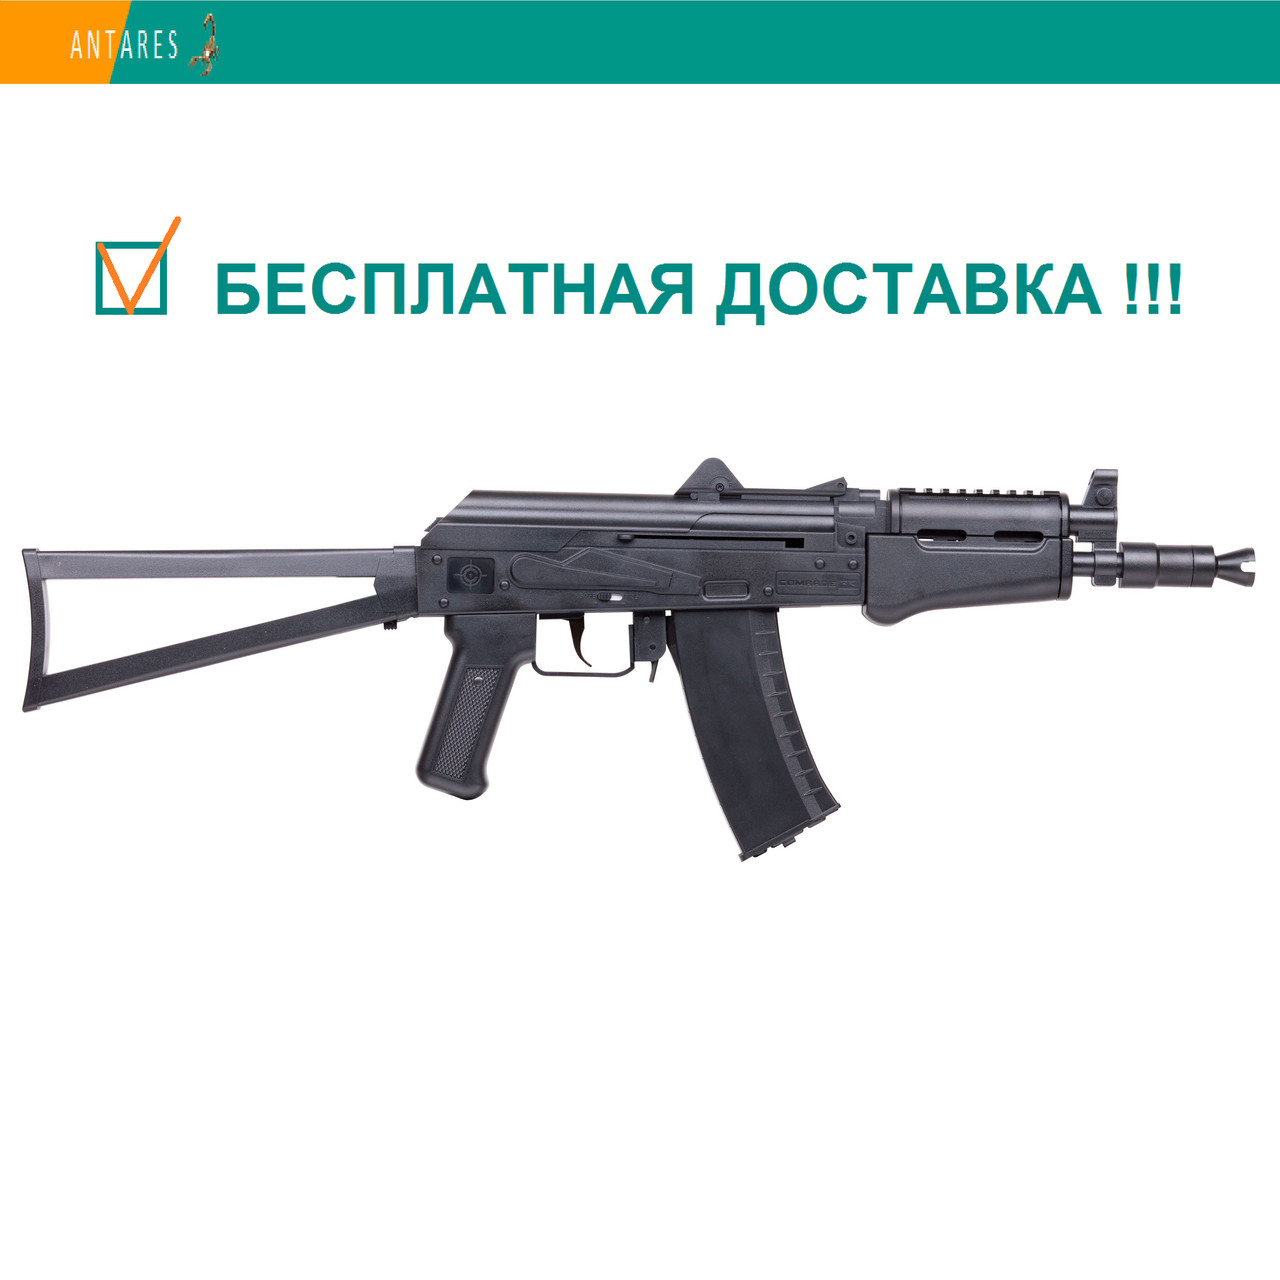 Пневматическая винтовка Crosman Comrade AK (копия автомата Калашникова АКСУ) CCA4B1 газобаллонная CO2 180 м/с